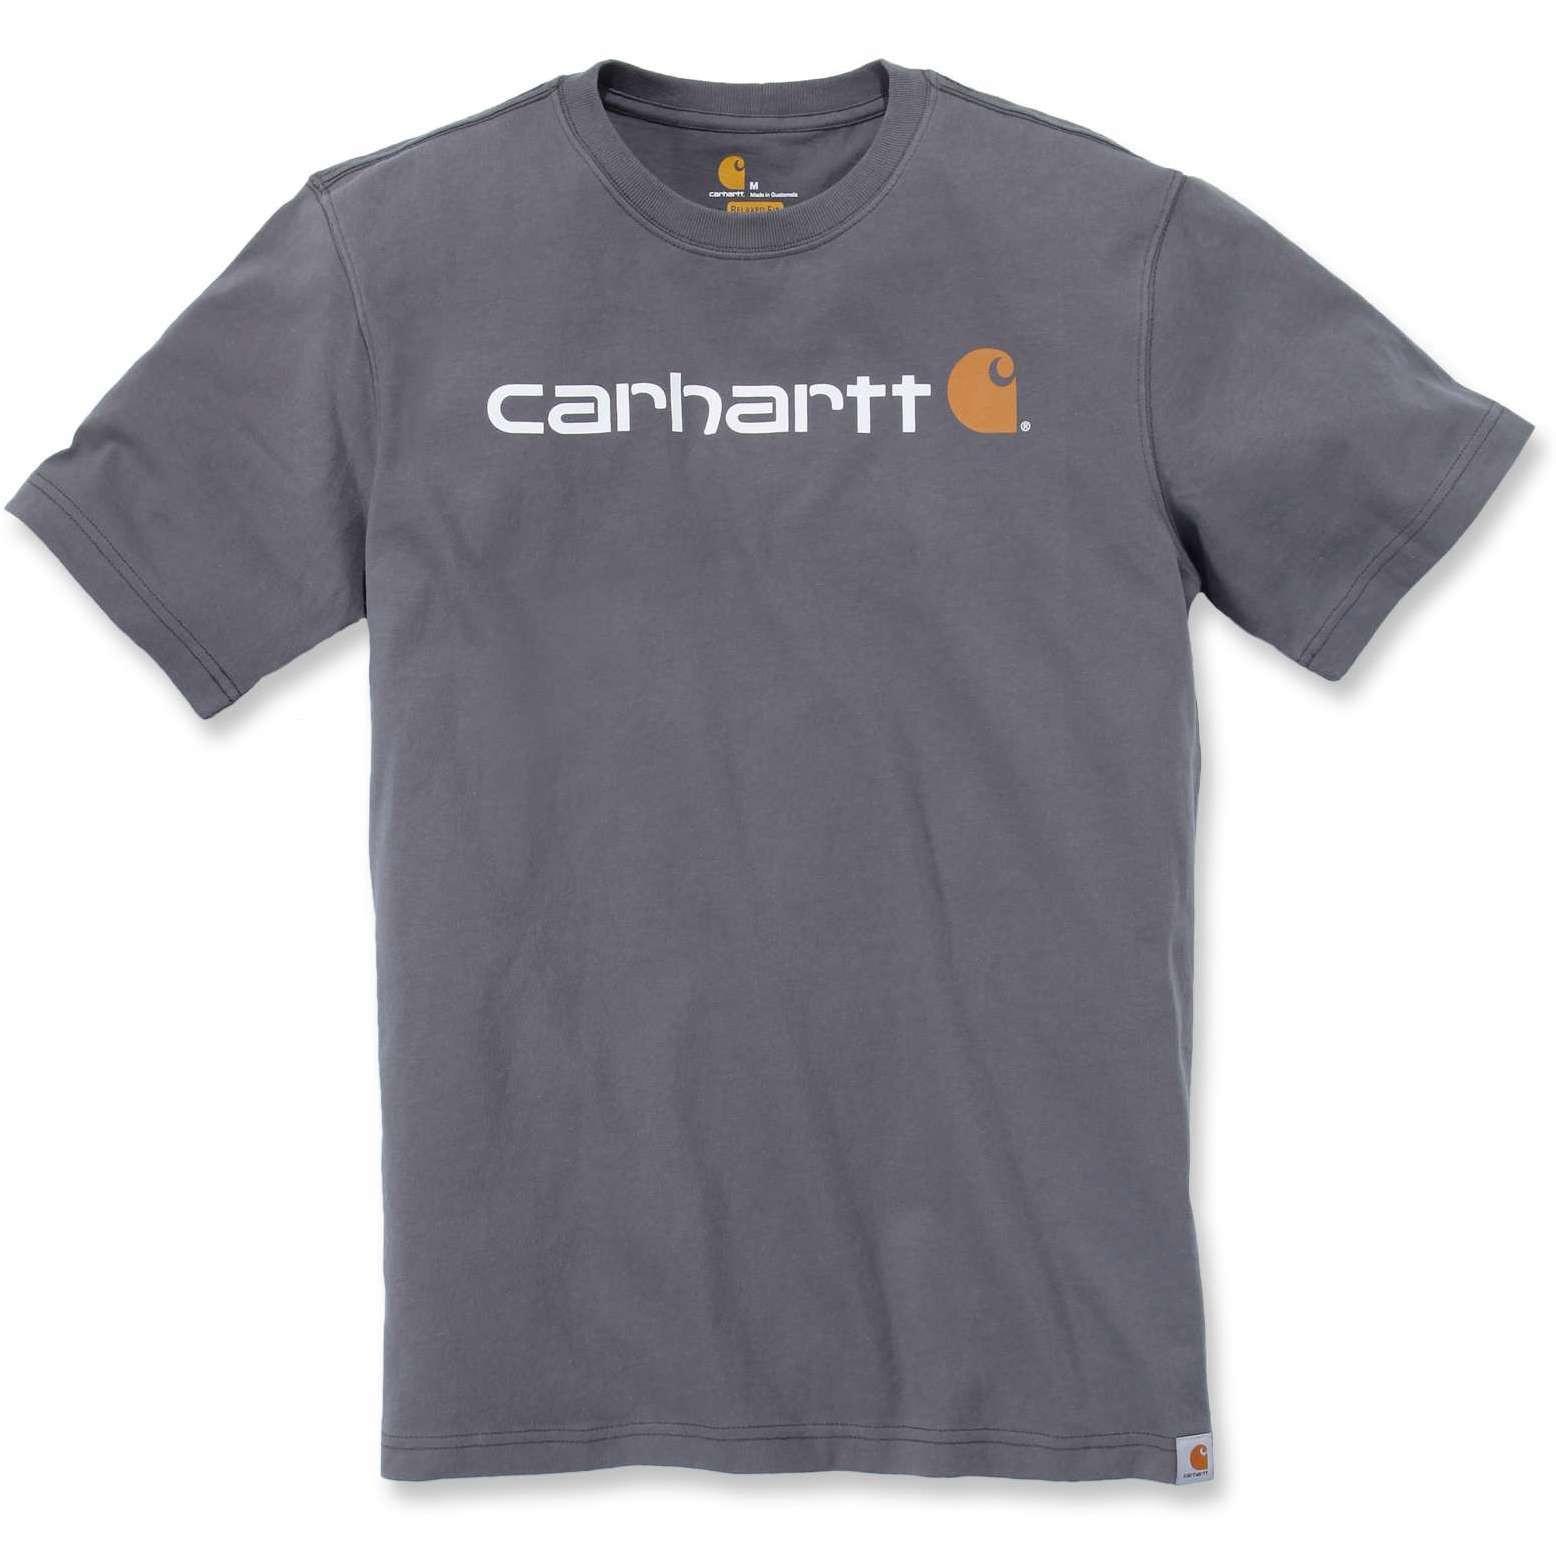 Футболка Carhartt Core Logo T-Shirt S/S - 103361 (Charcoal, S)